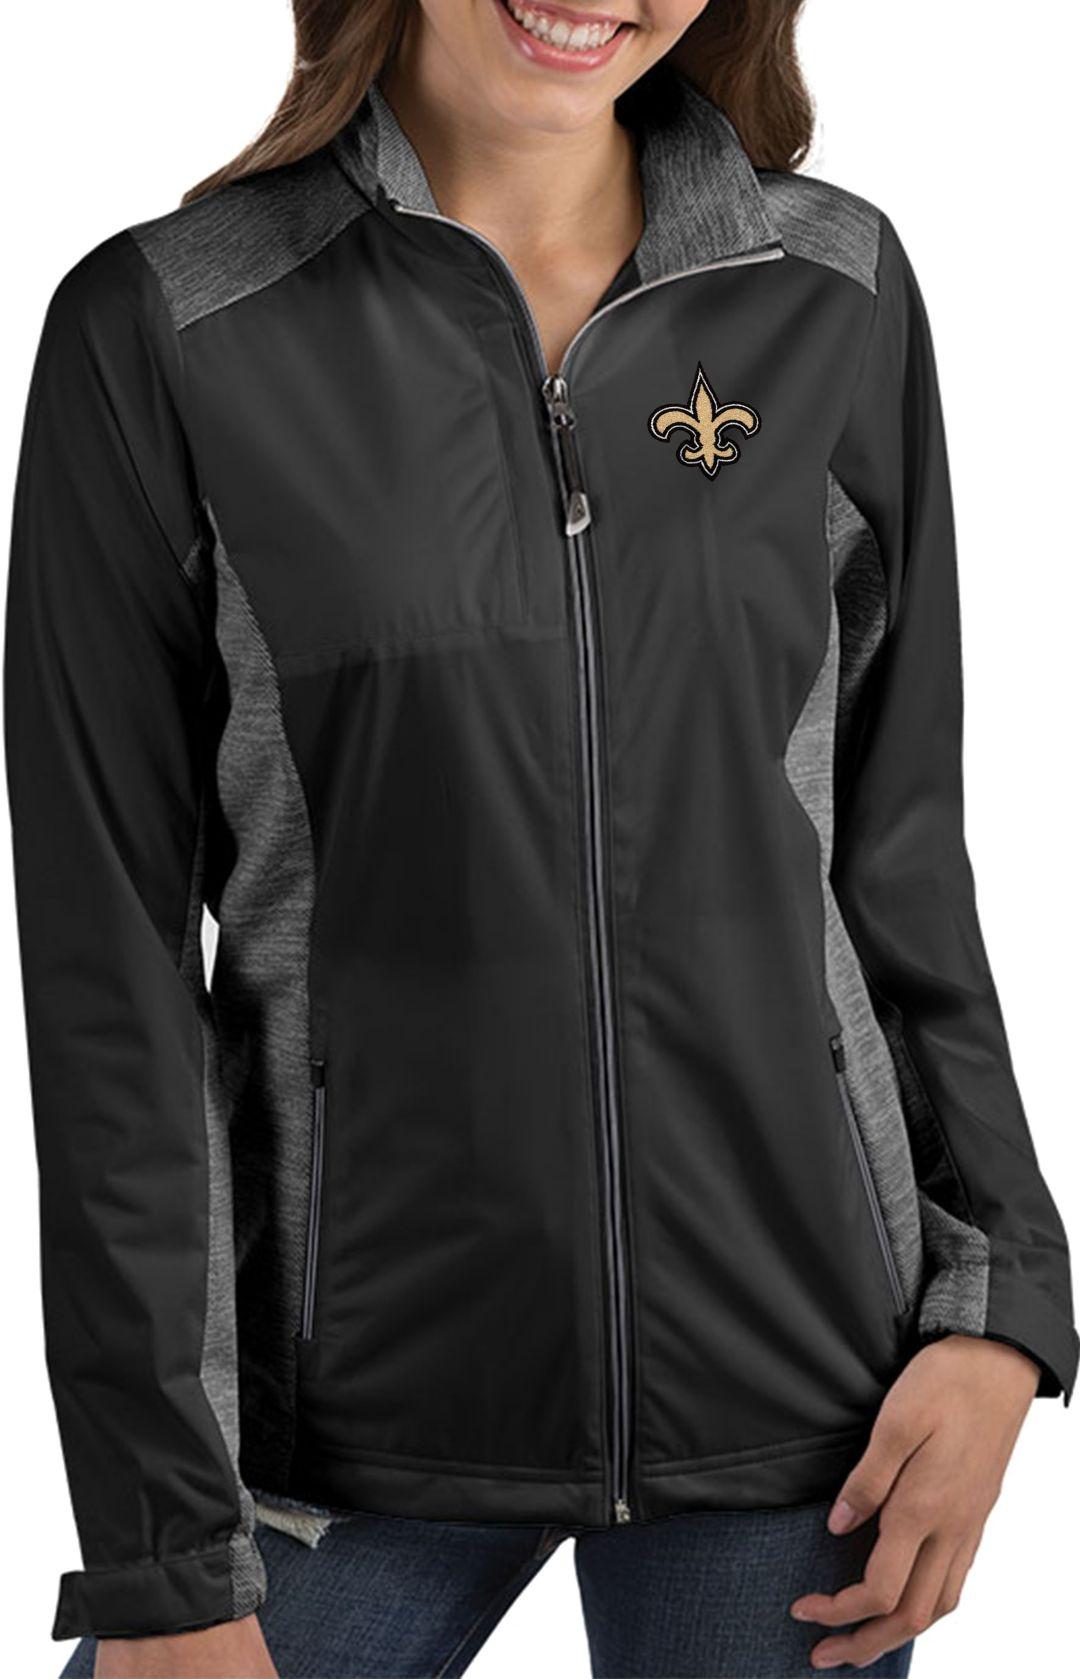 a72c40ab Antigua Women's New Orleans Saints Revolve Black Full-Zip Jacket